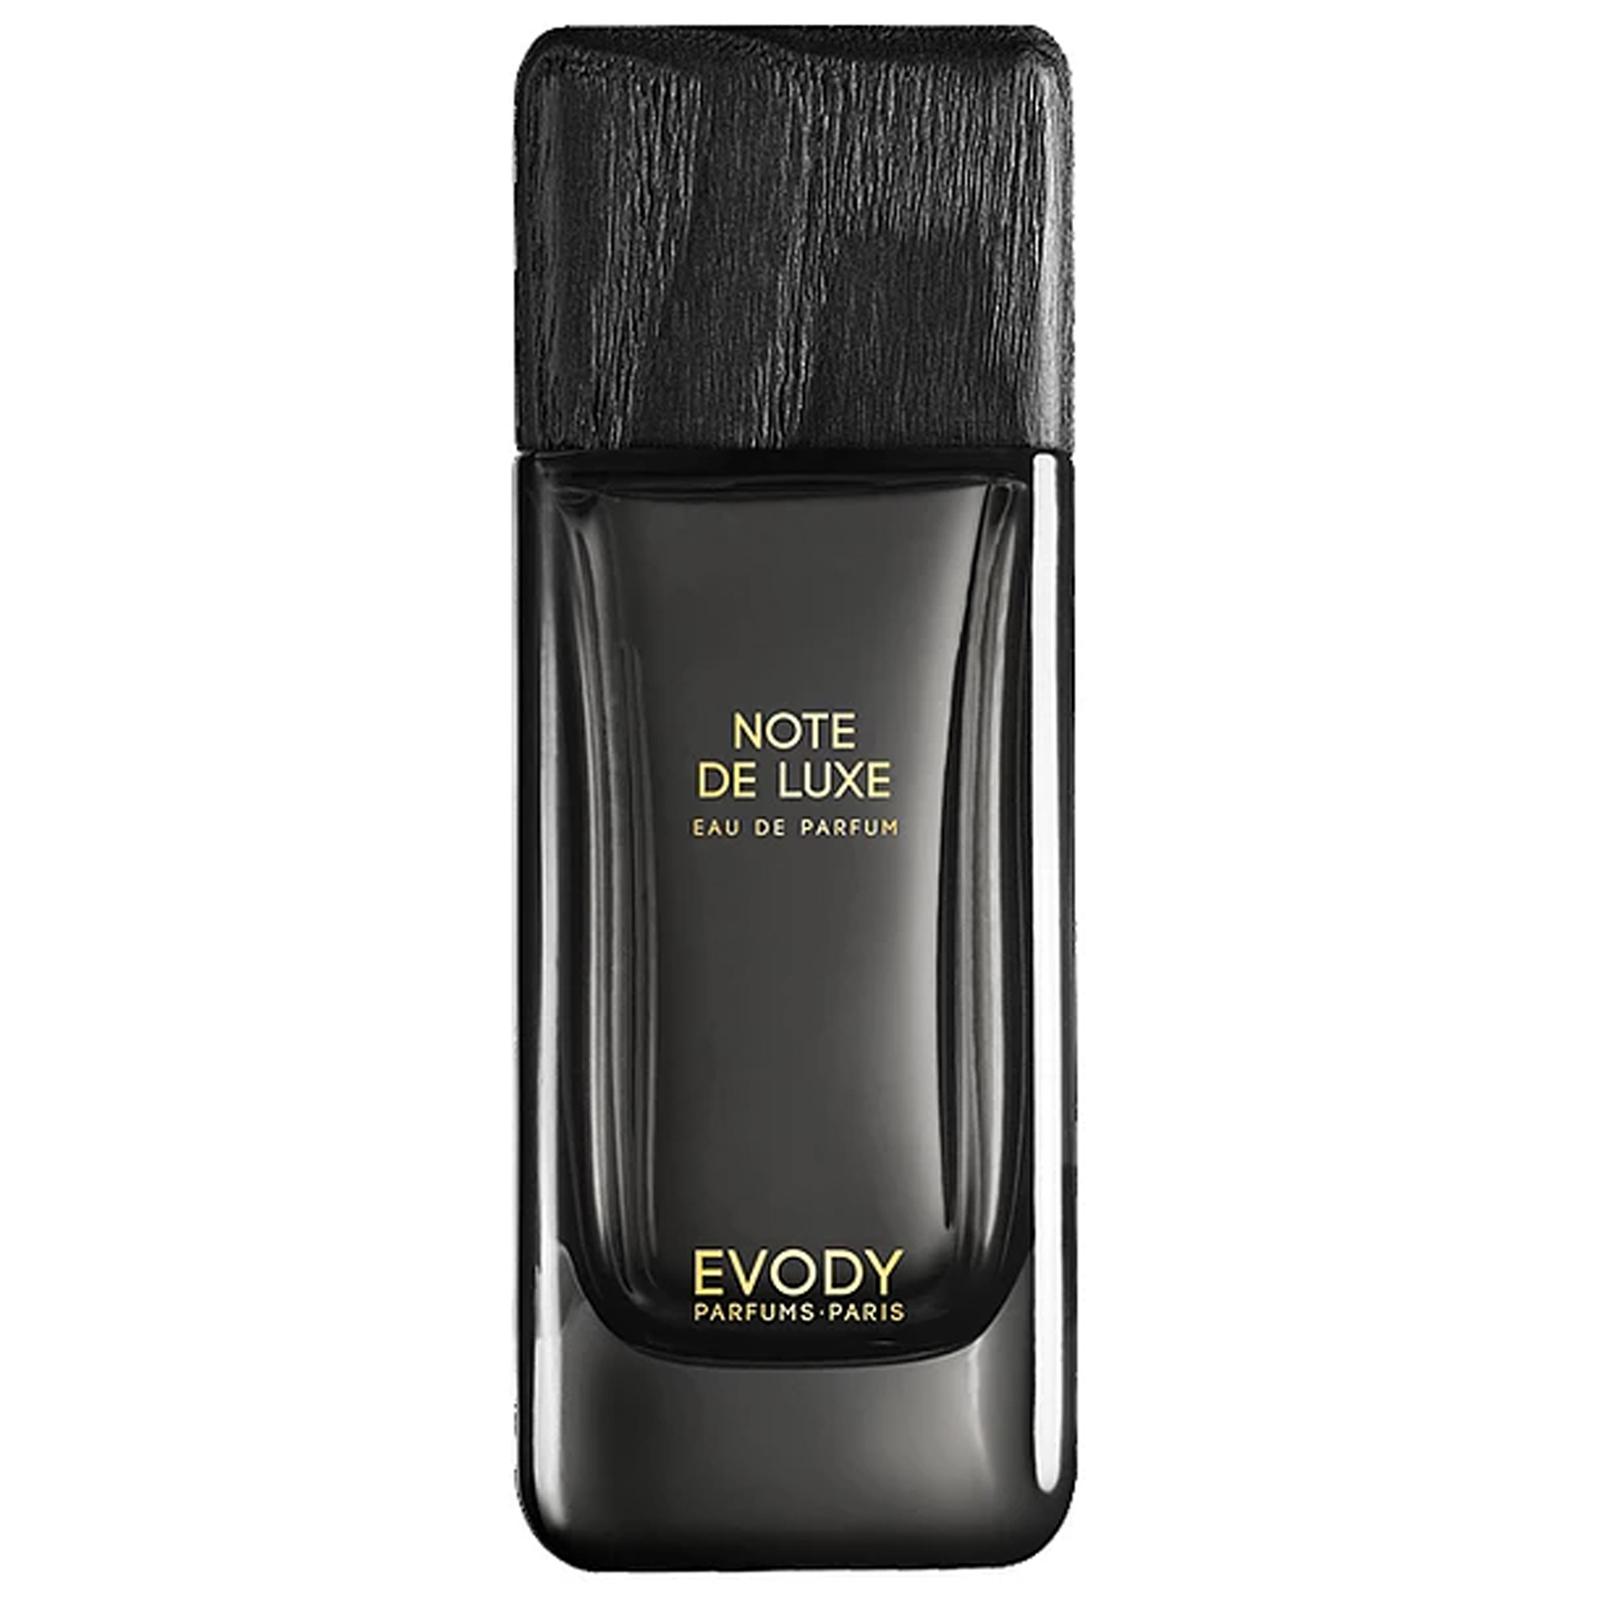 Note de luxe profumo eau de parfum 100 ml